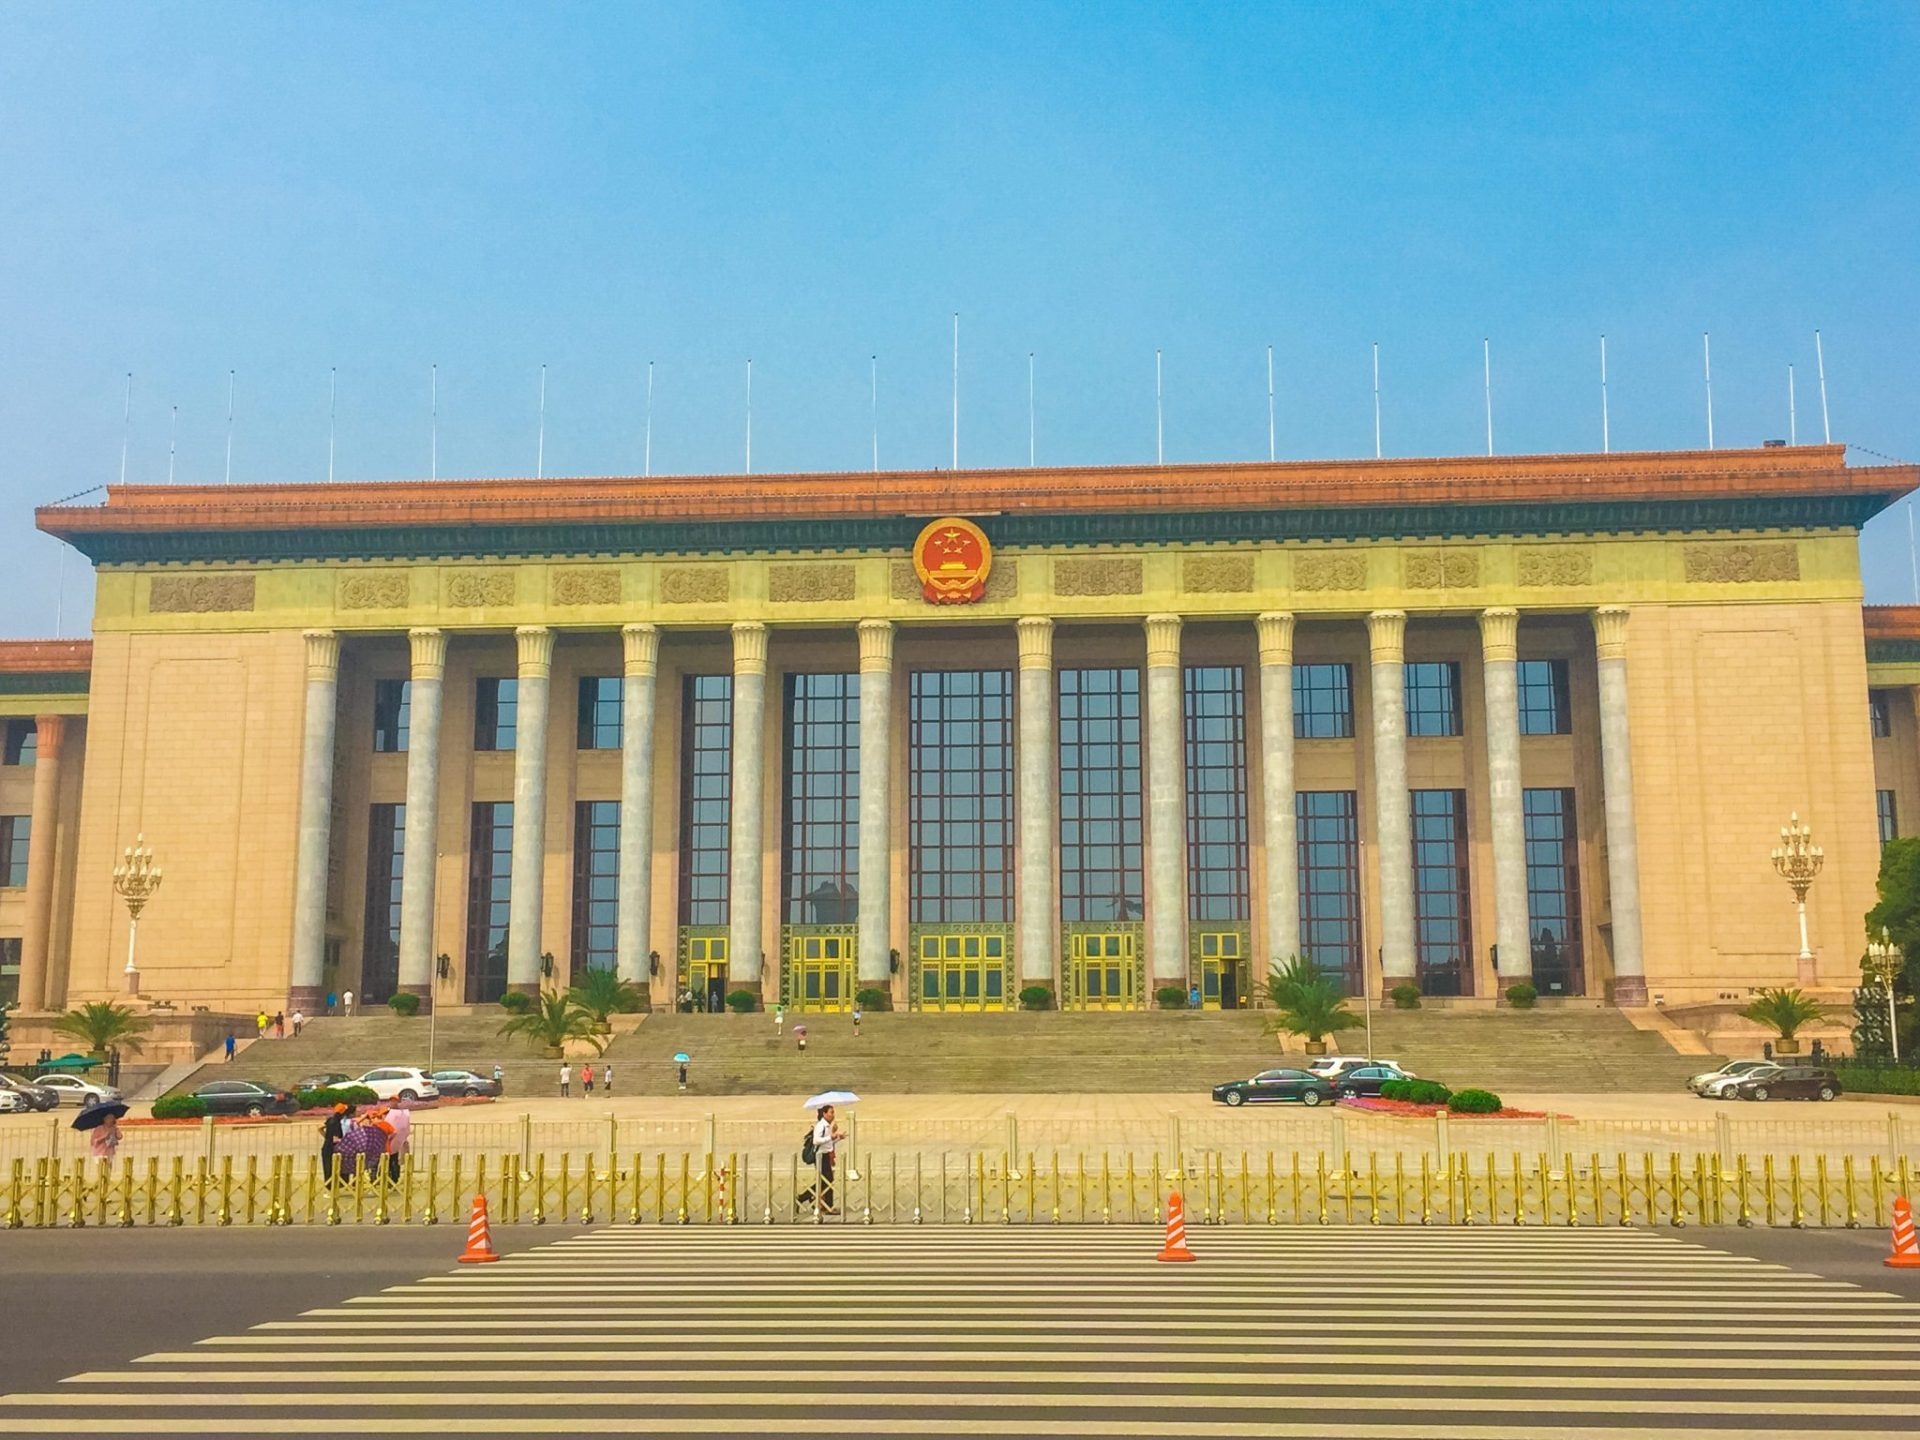 el museo nacional de China - pekin en 1 dia